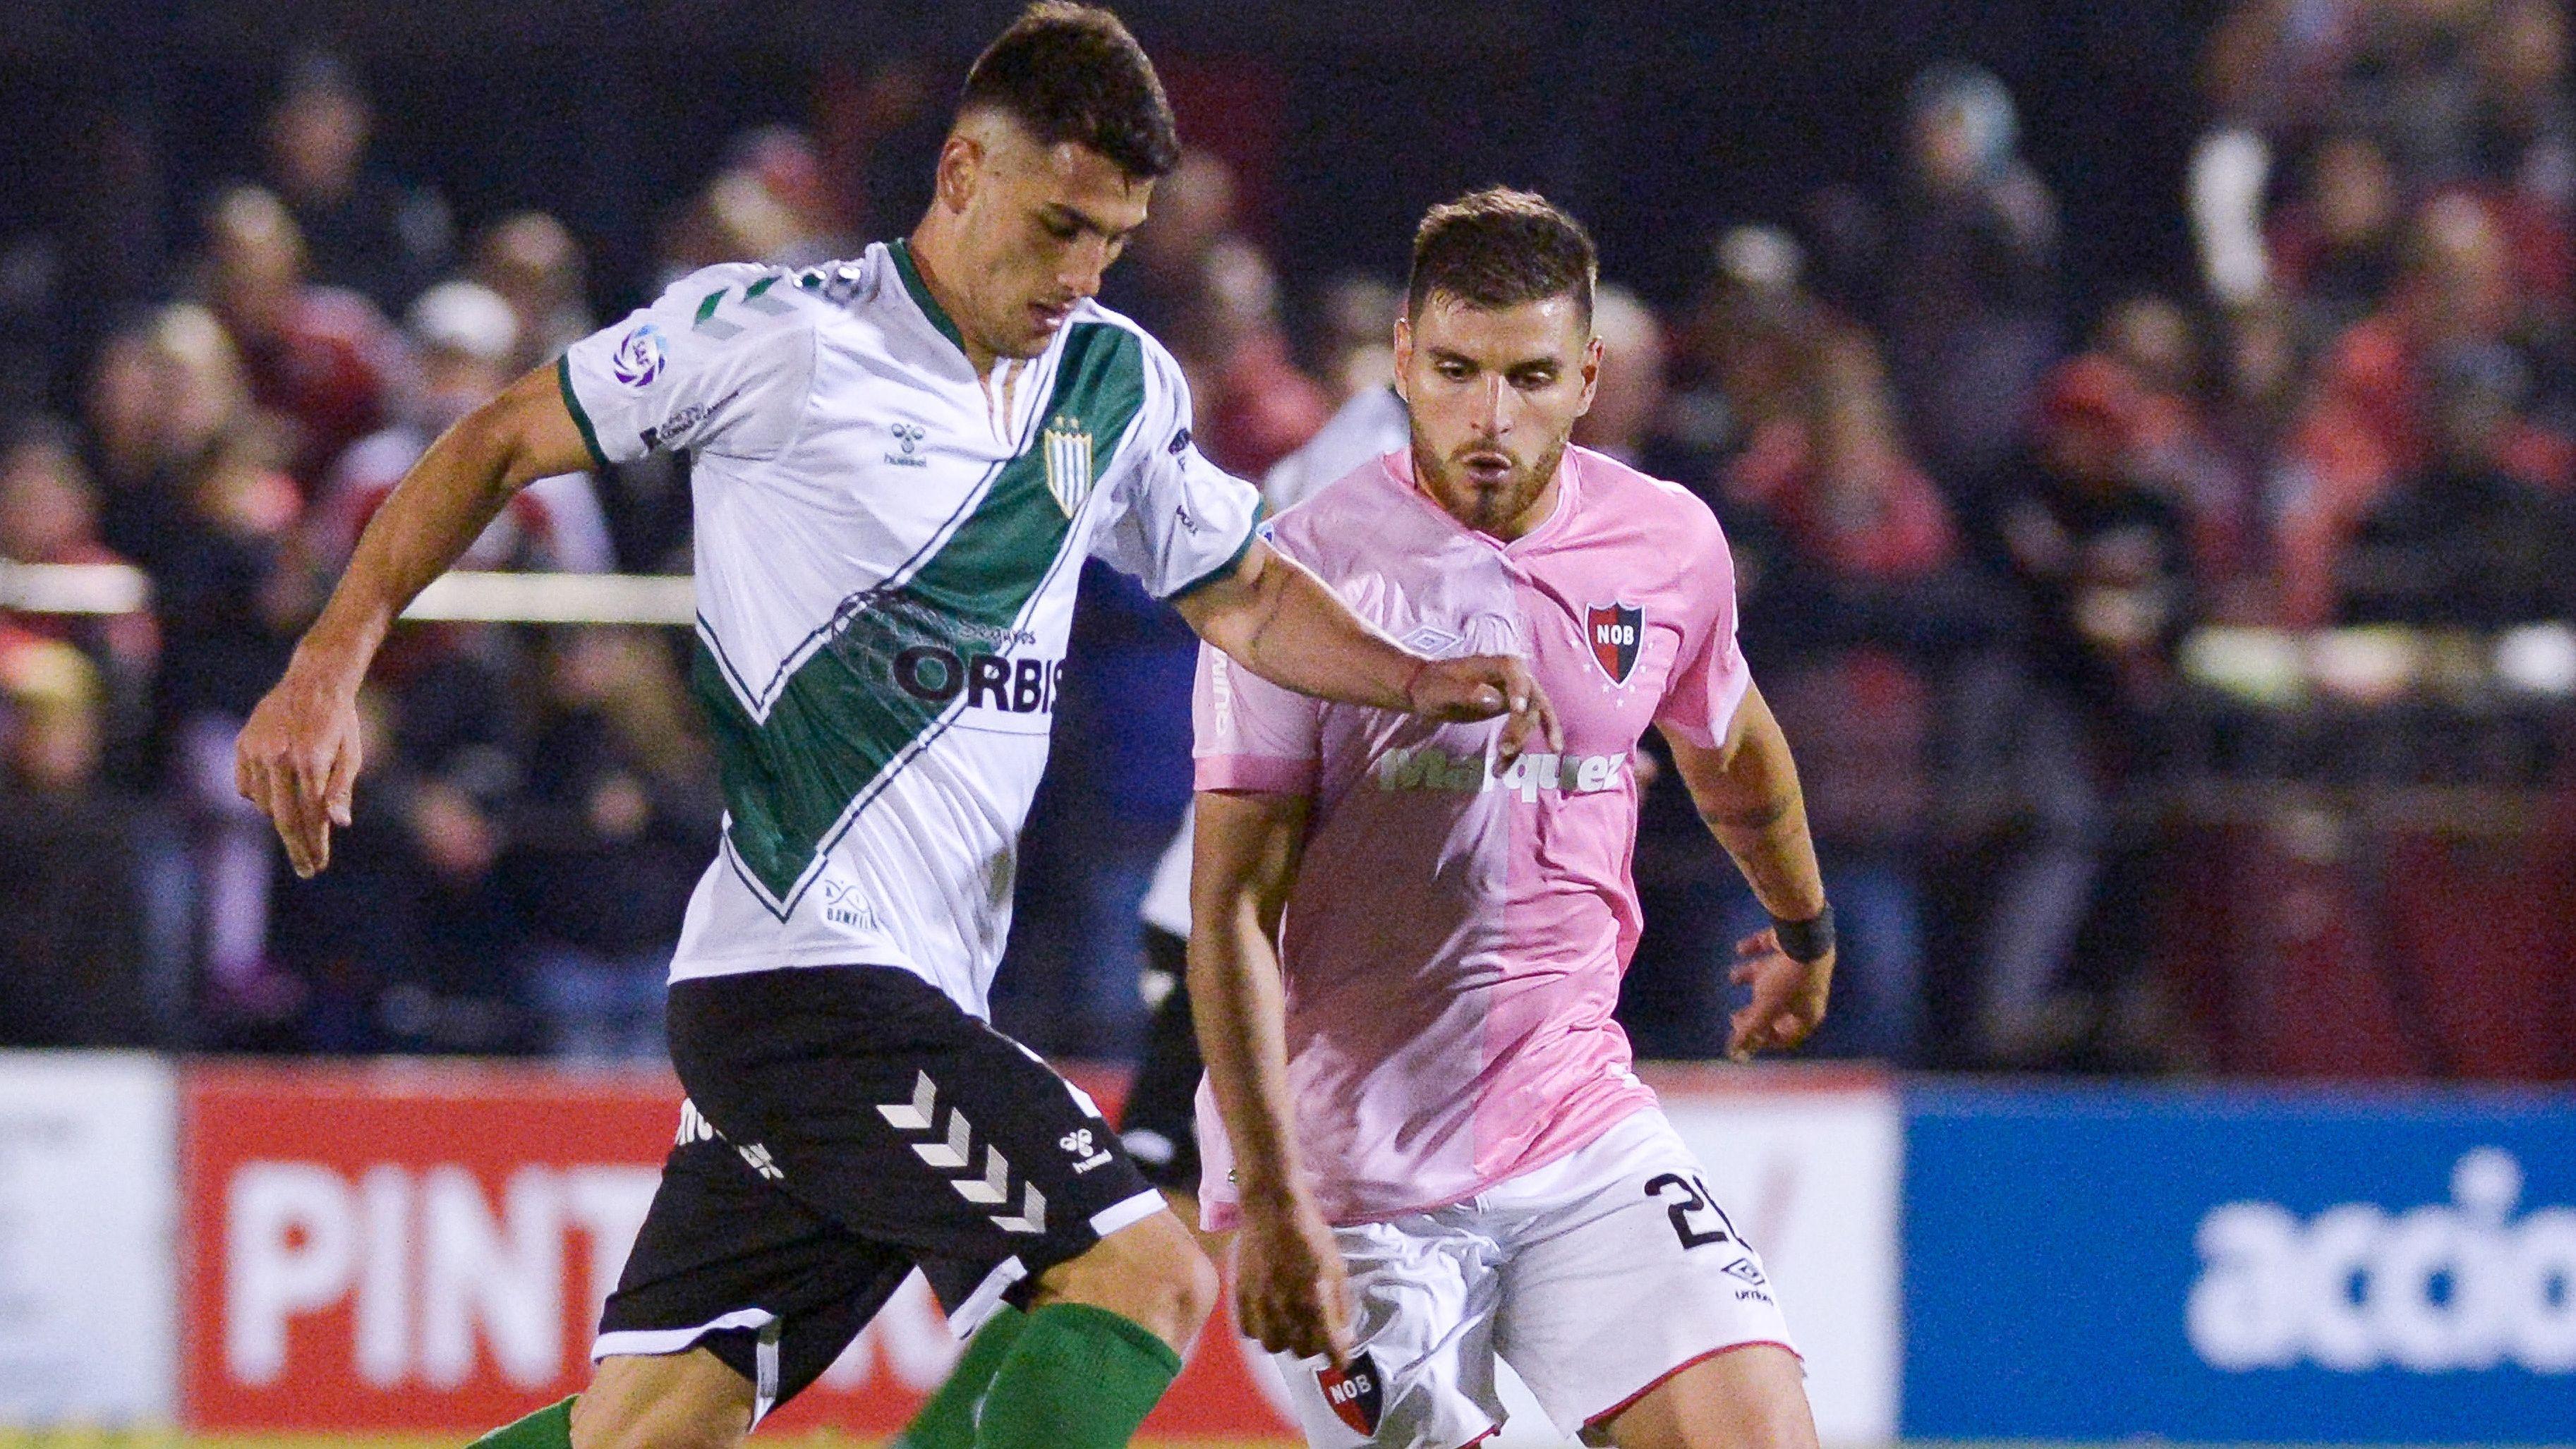 Newell's y Banfield se enfrentan en Rosario (Telam)